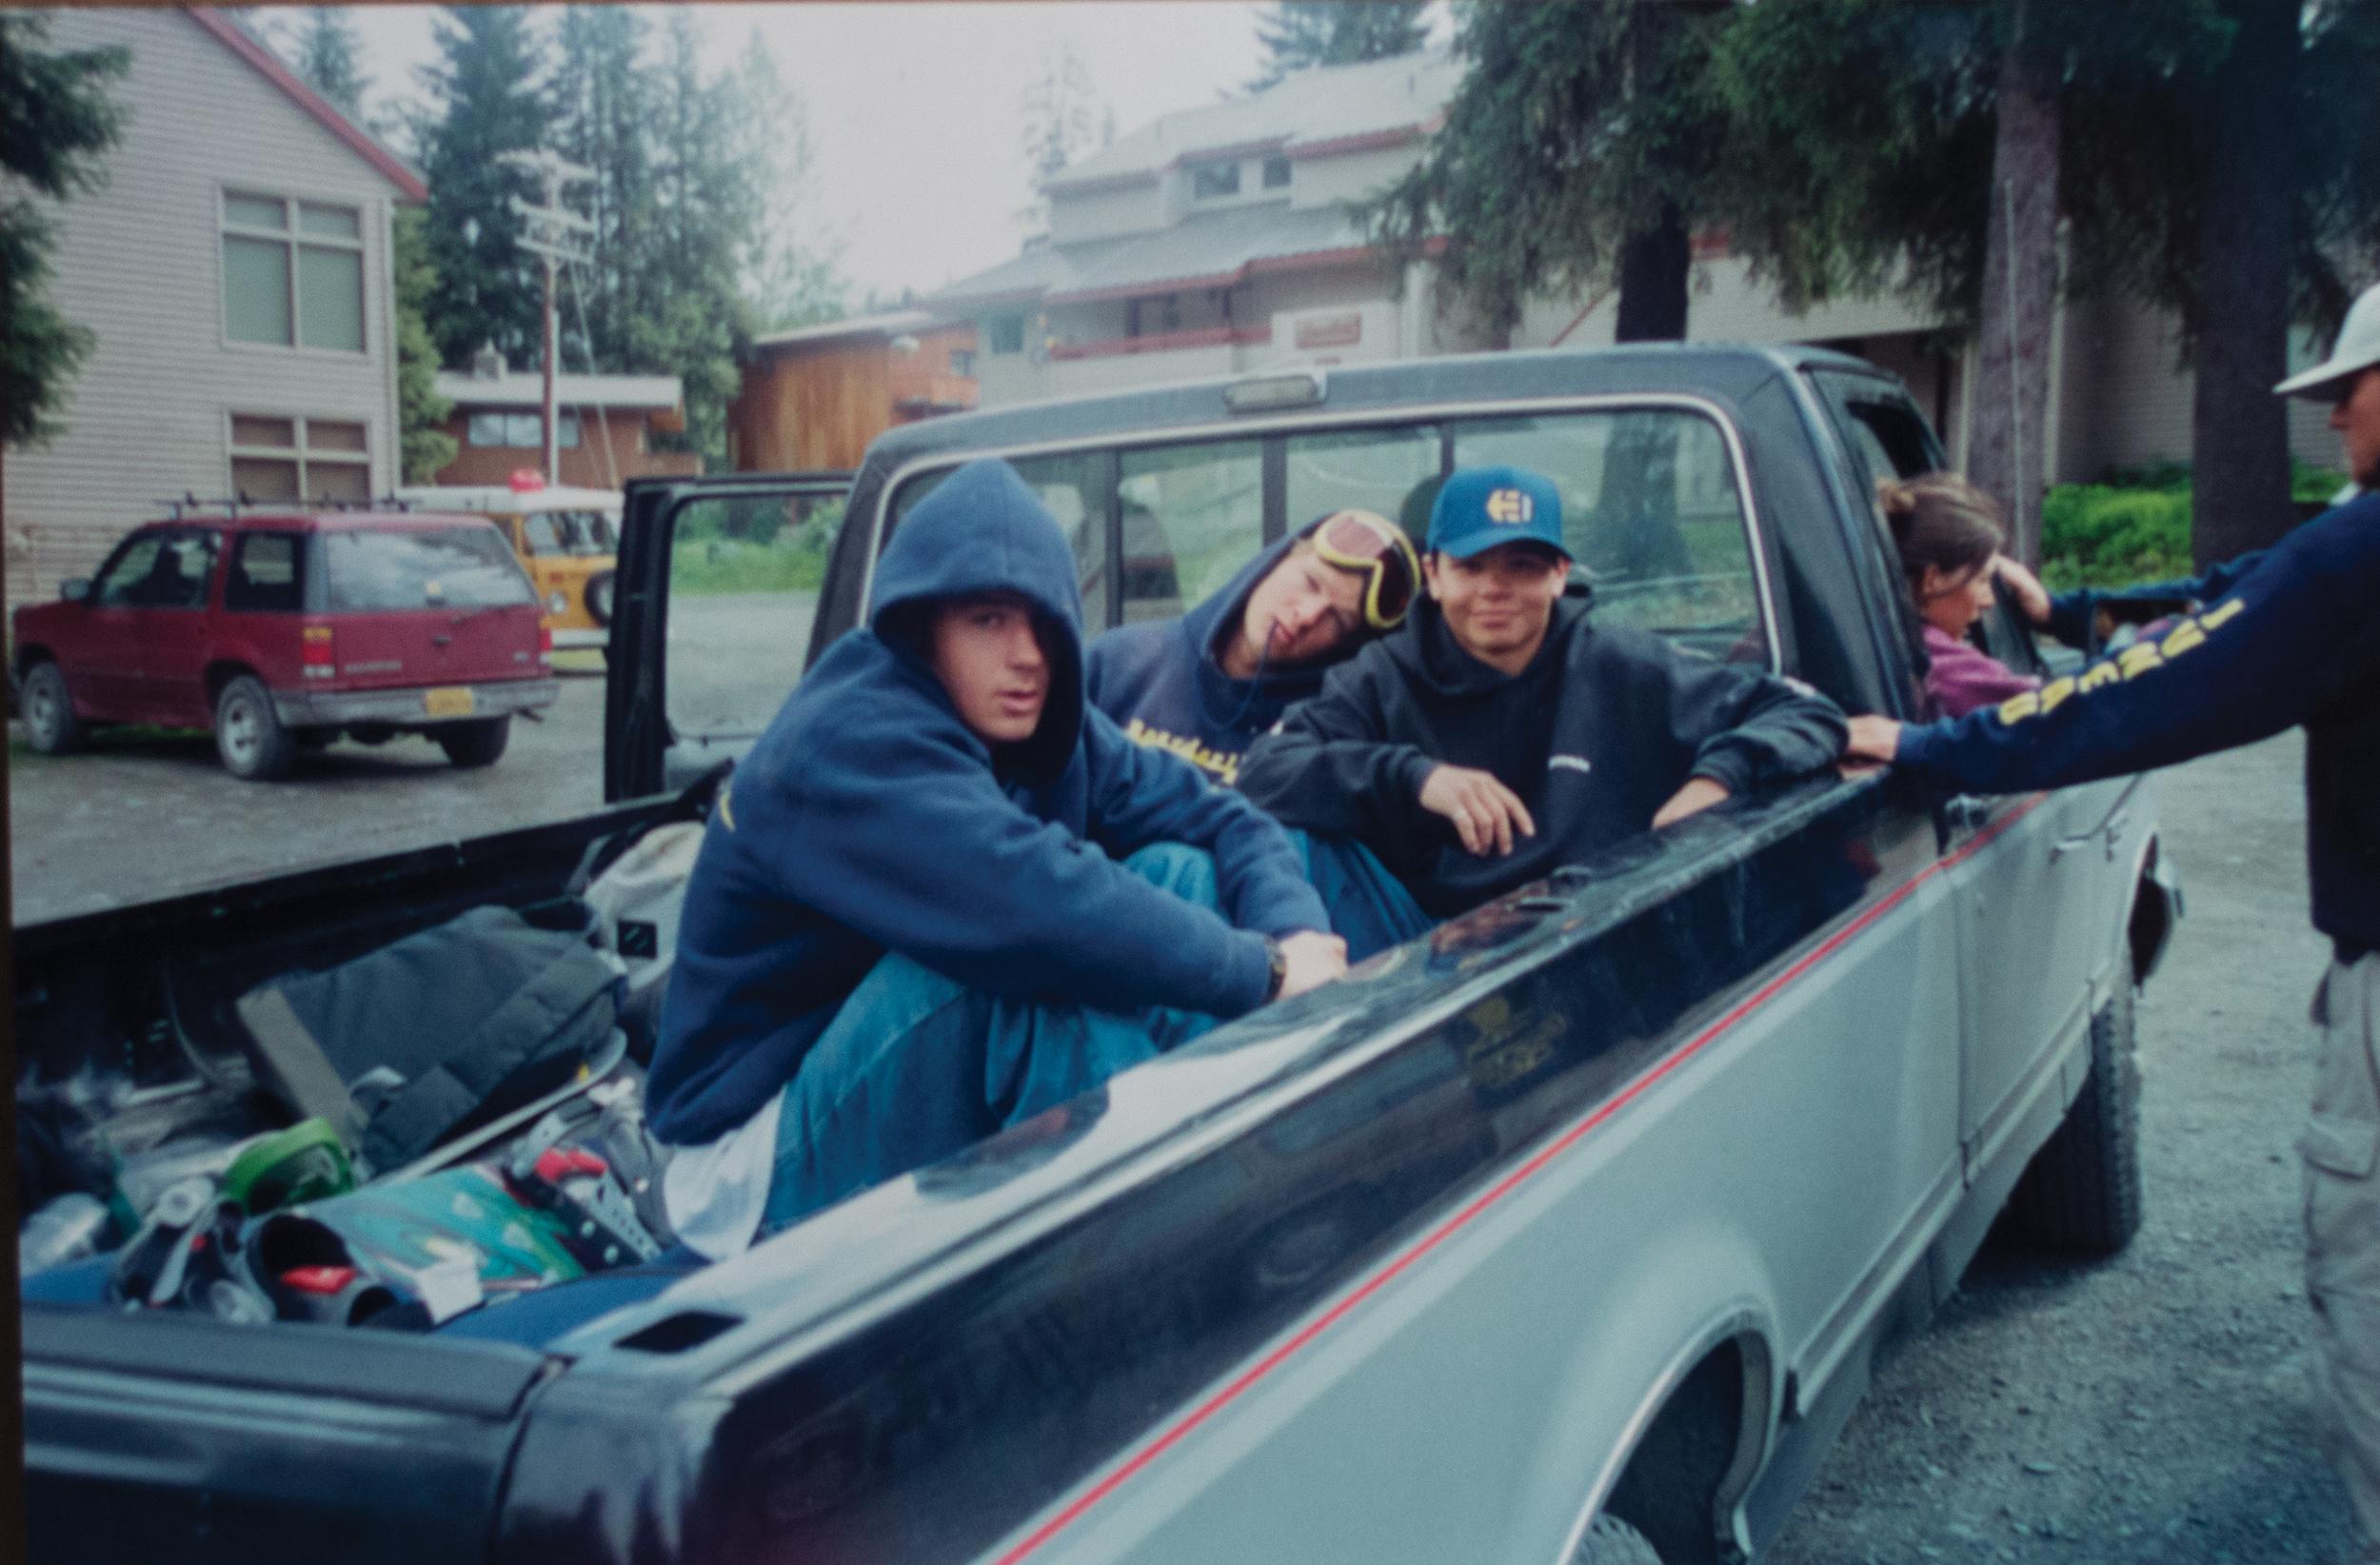 Chuck Clasby, Ashley Call, Sonny Pitman.jpg